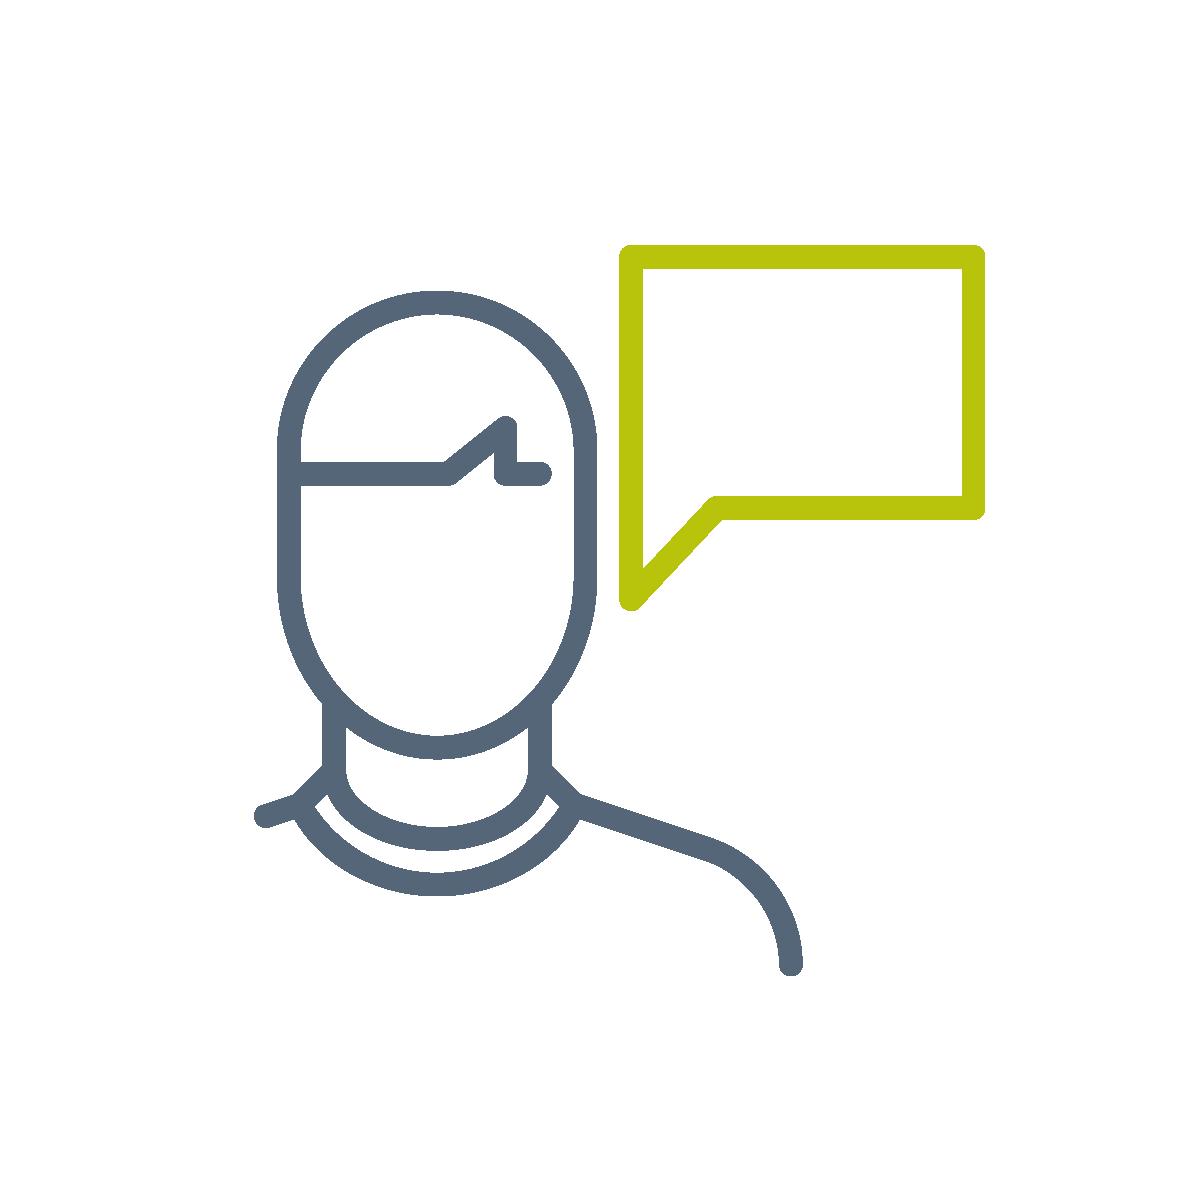 Diagram Icon - DECICATED SUPPORT